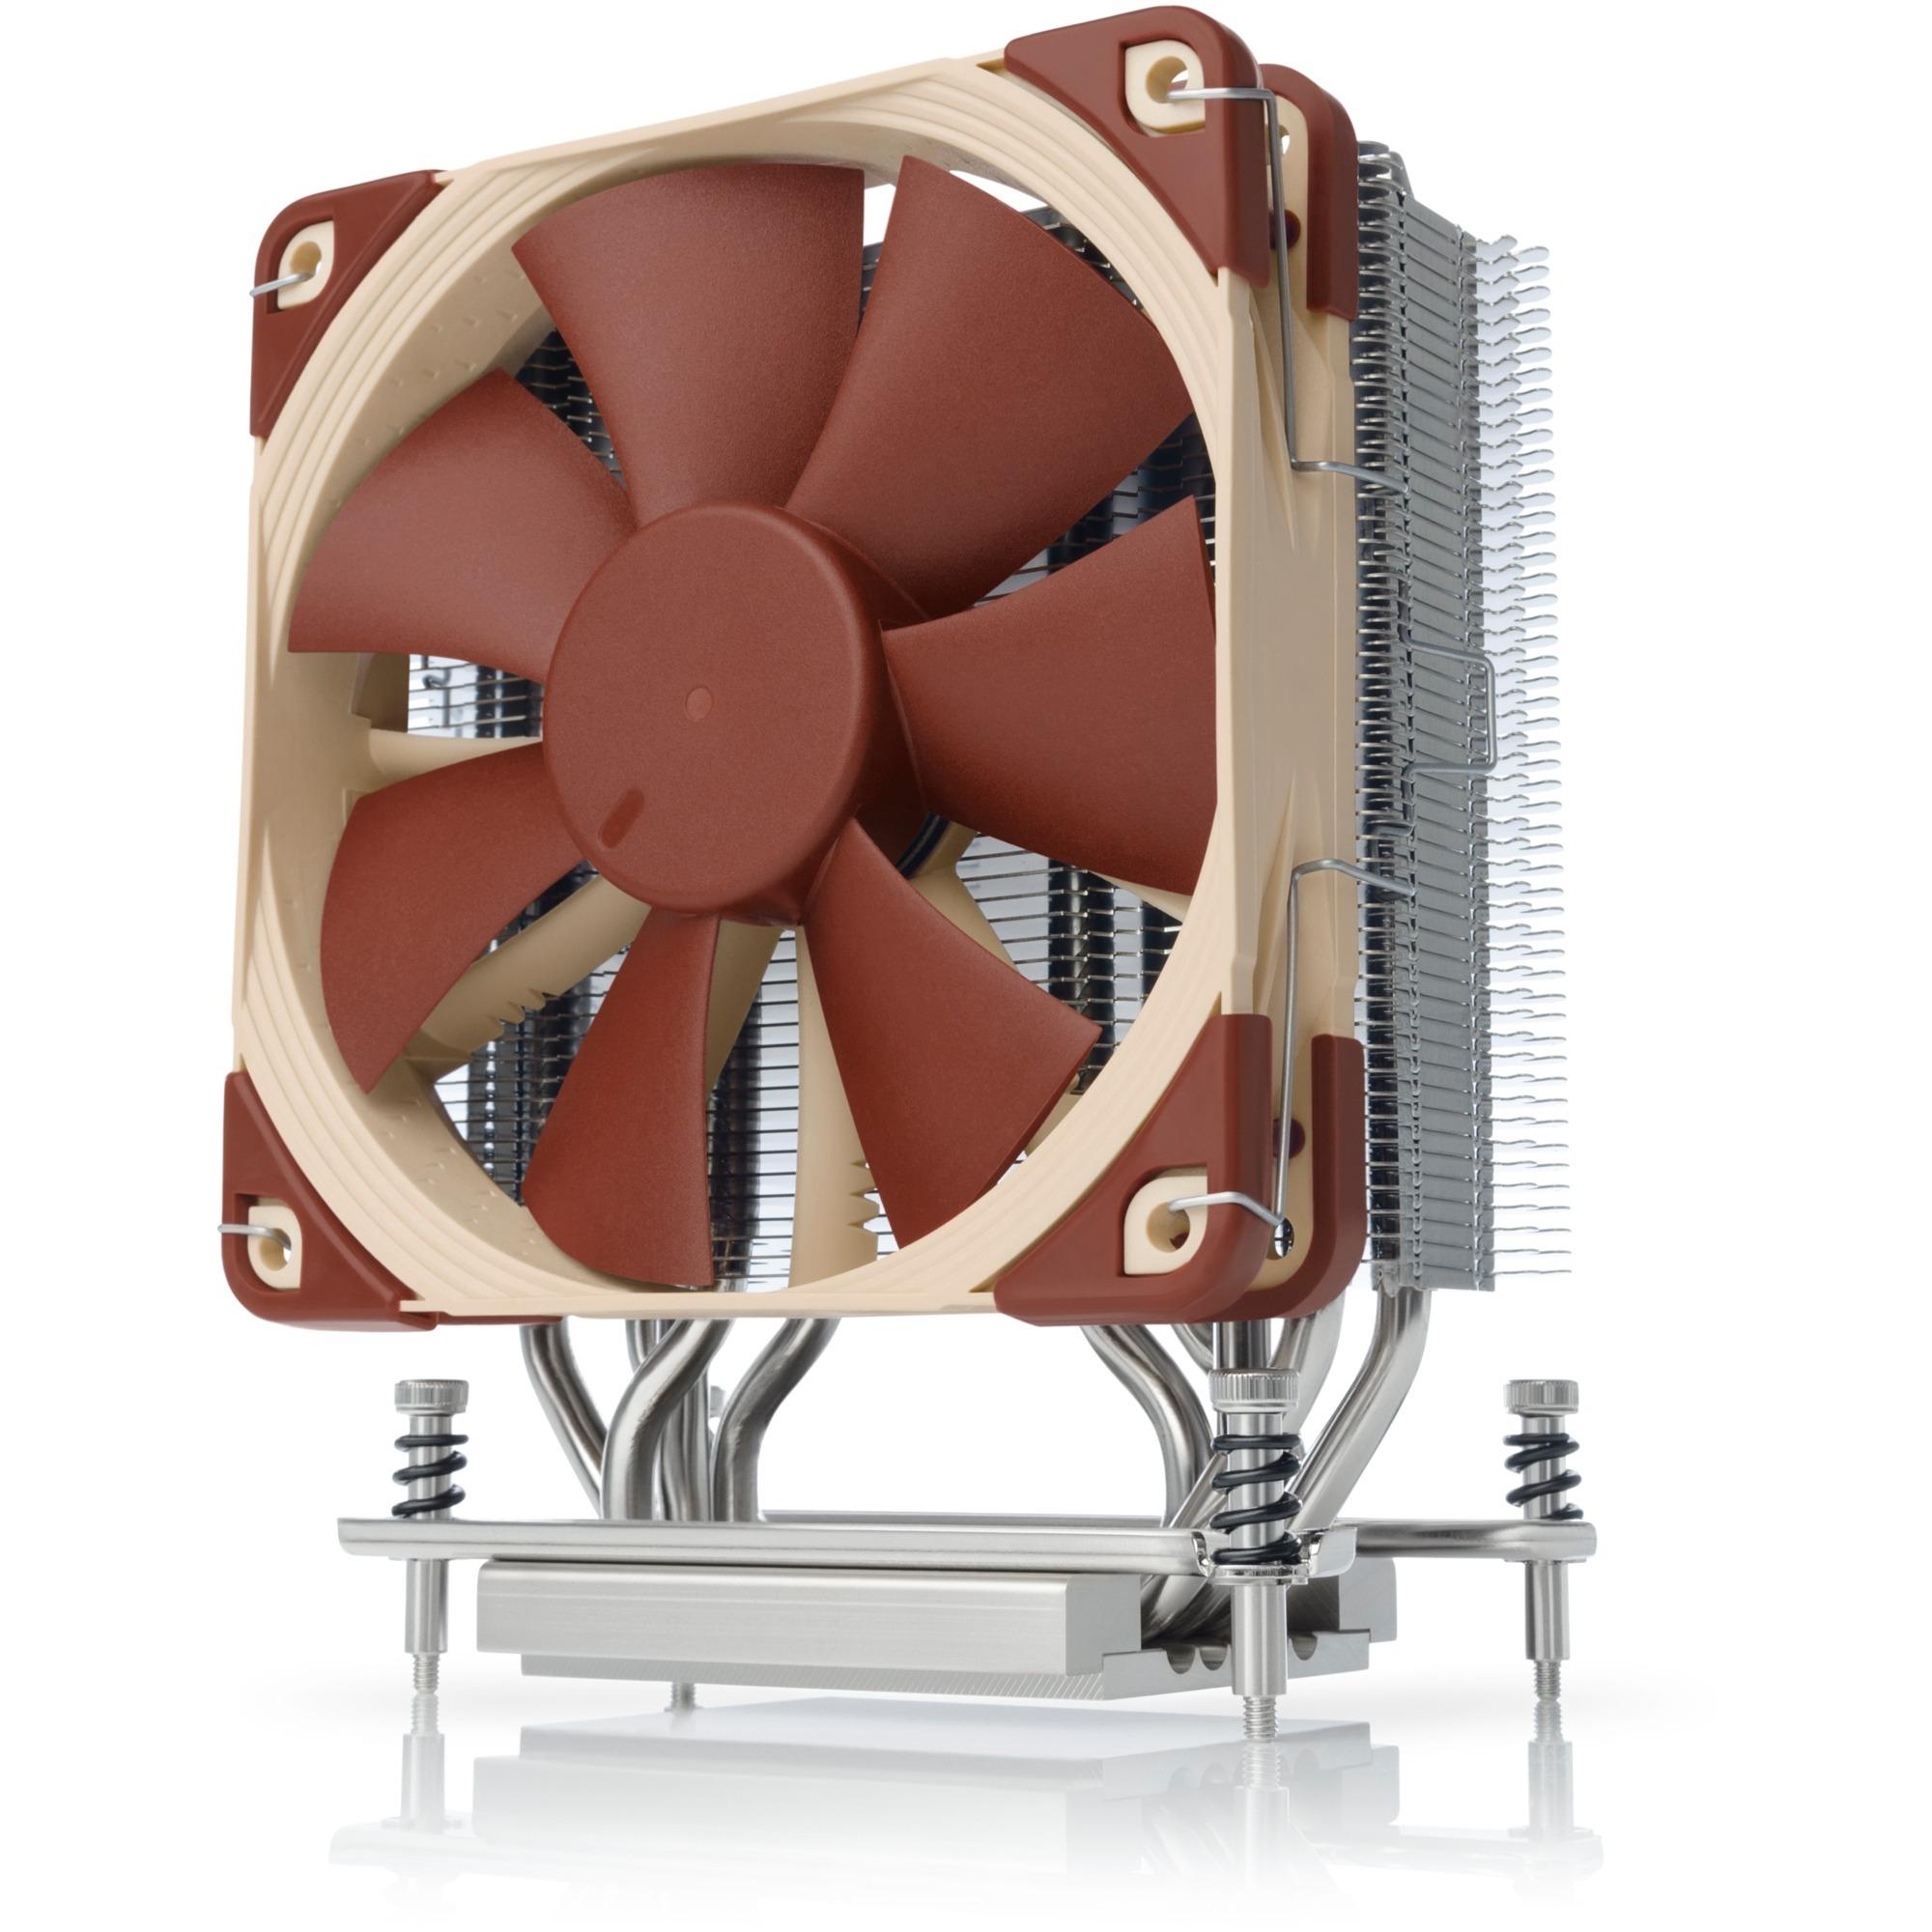 NH-U12S TR4-SP3 Processeur Refroidisseur ventilateur, refroidisseur et radiateur, Ventirad